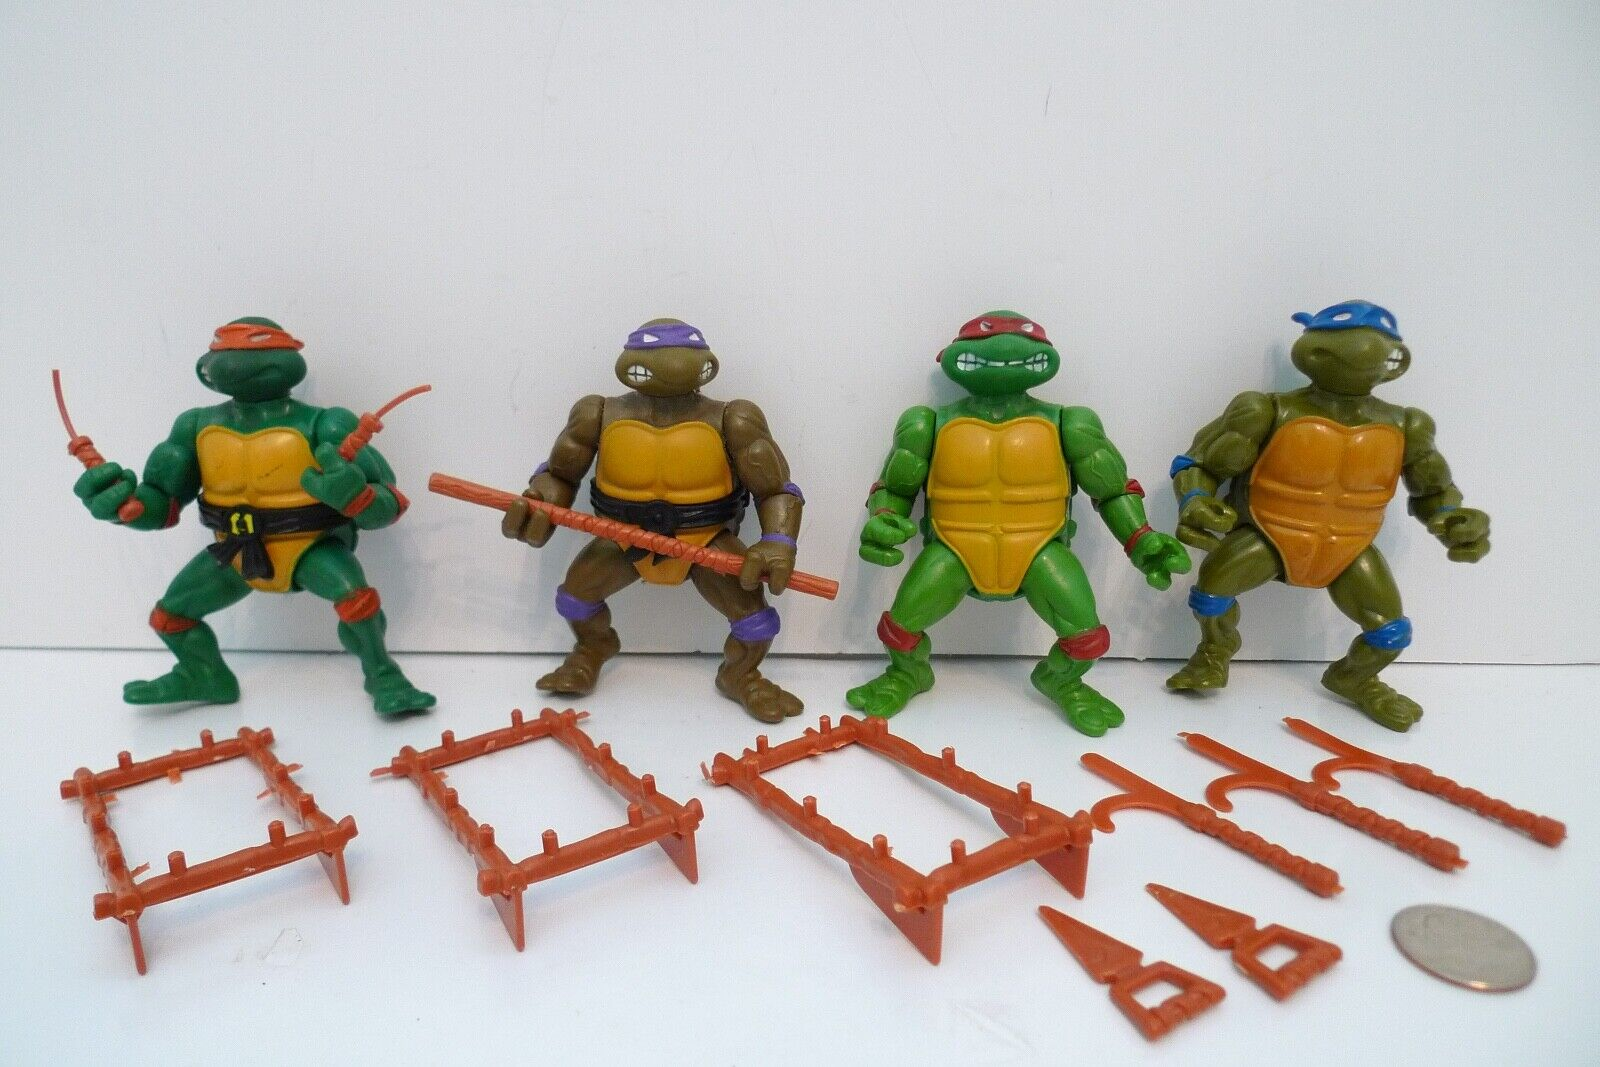 Jahrgang 1988 TMNT Ninja Turtles Set aus 4-Waffen Don Raph Mike Leo Figur Masse